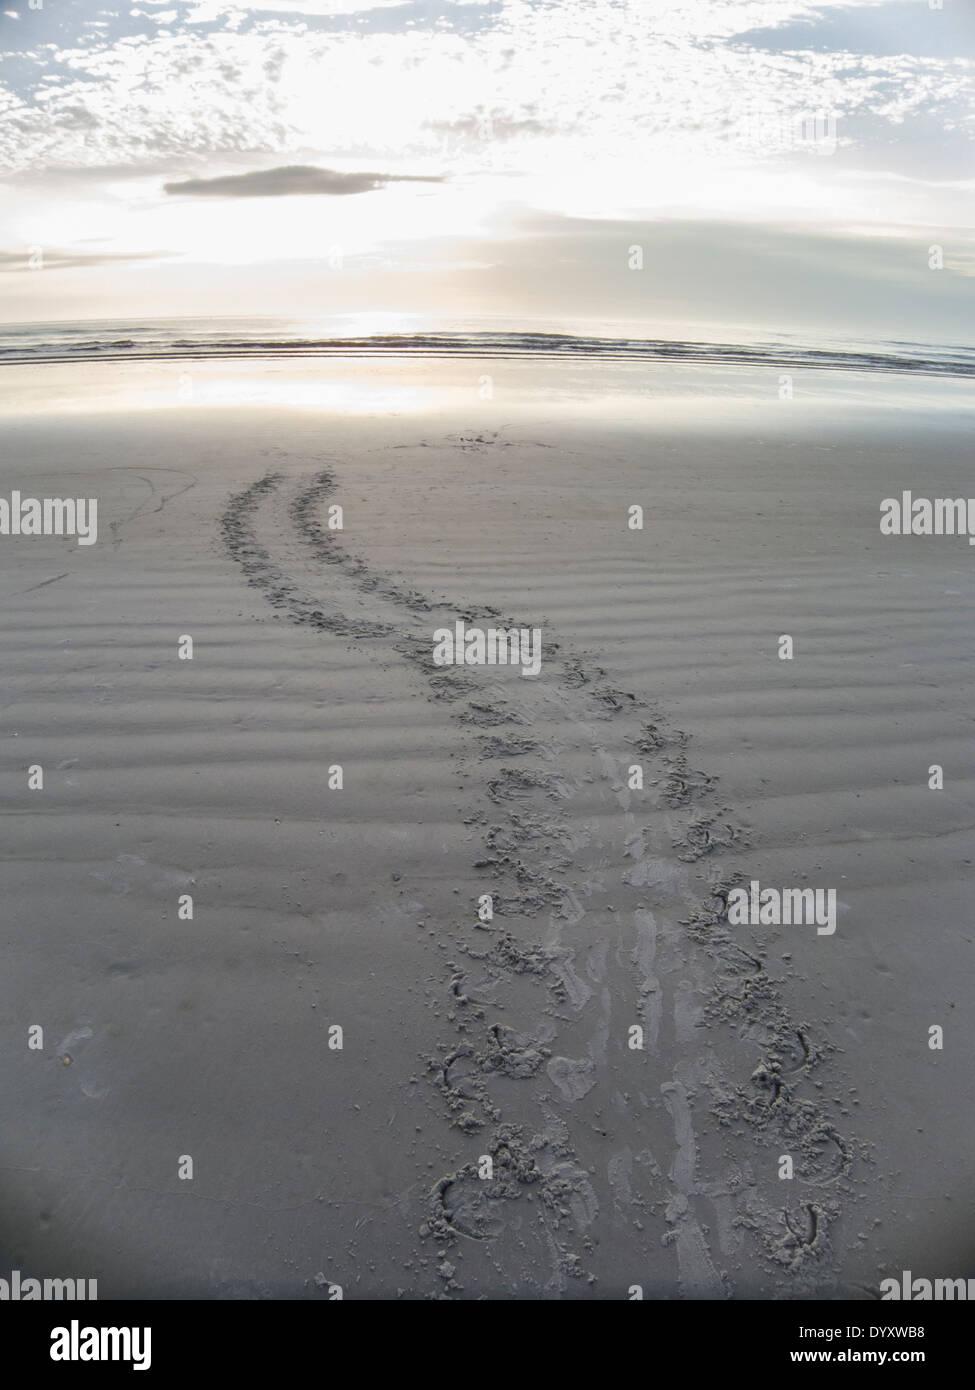 Nesting turtle tracks leading back to ocean at sunrise - Stock Image